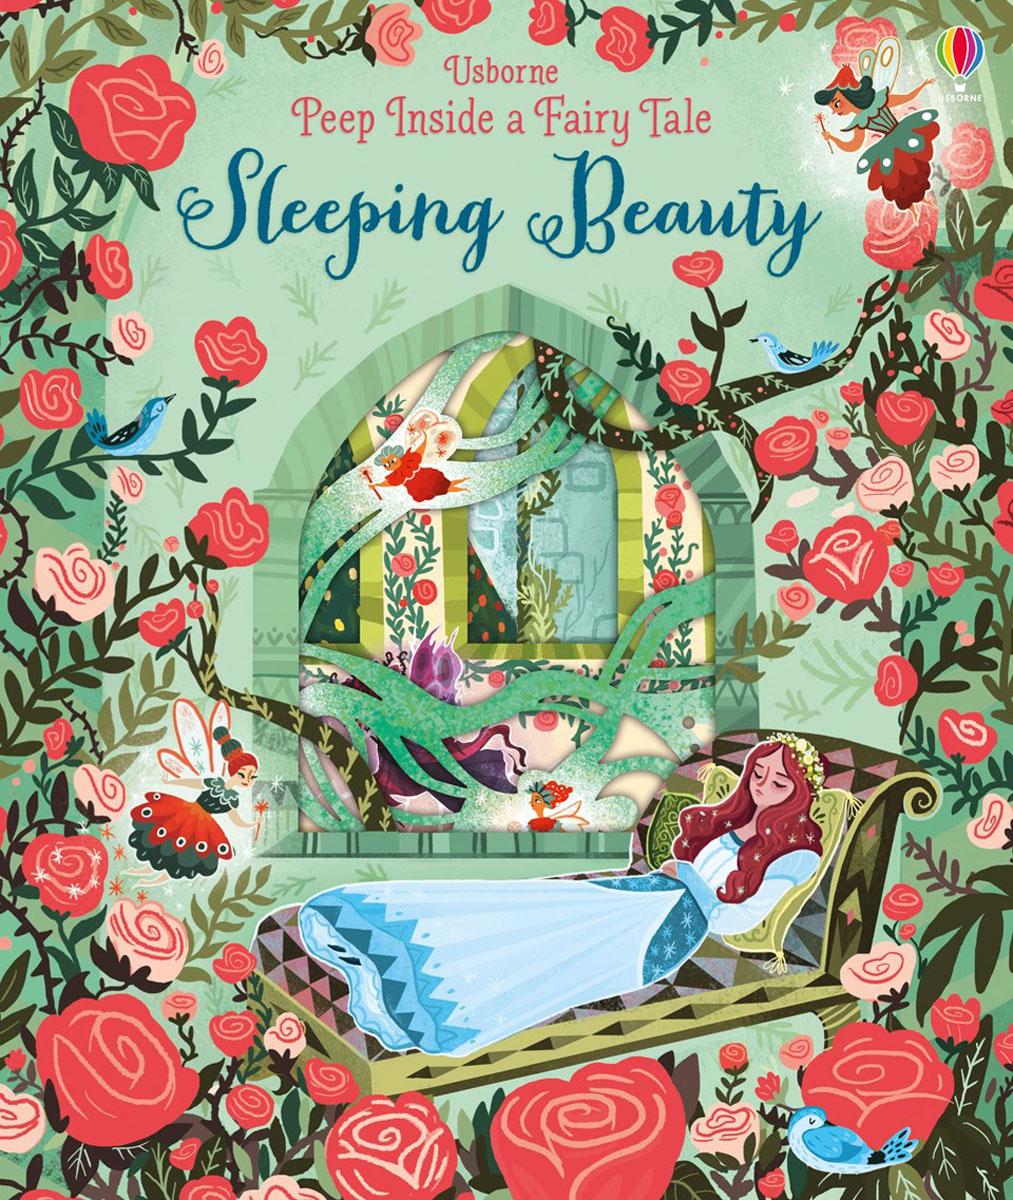 Peep inside a fairy tale: Sleeping Beauty a fairy tale